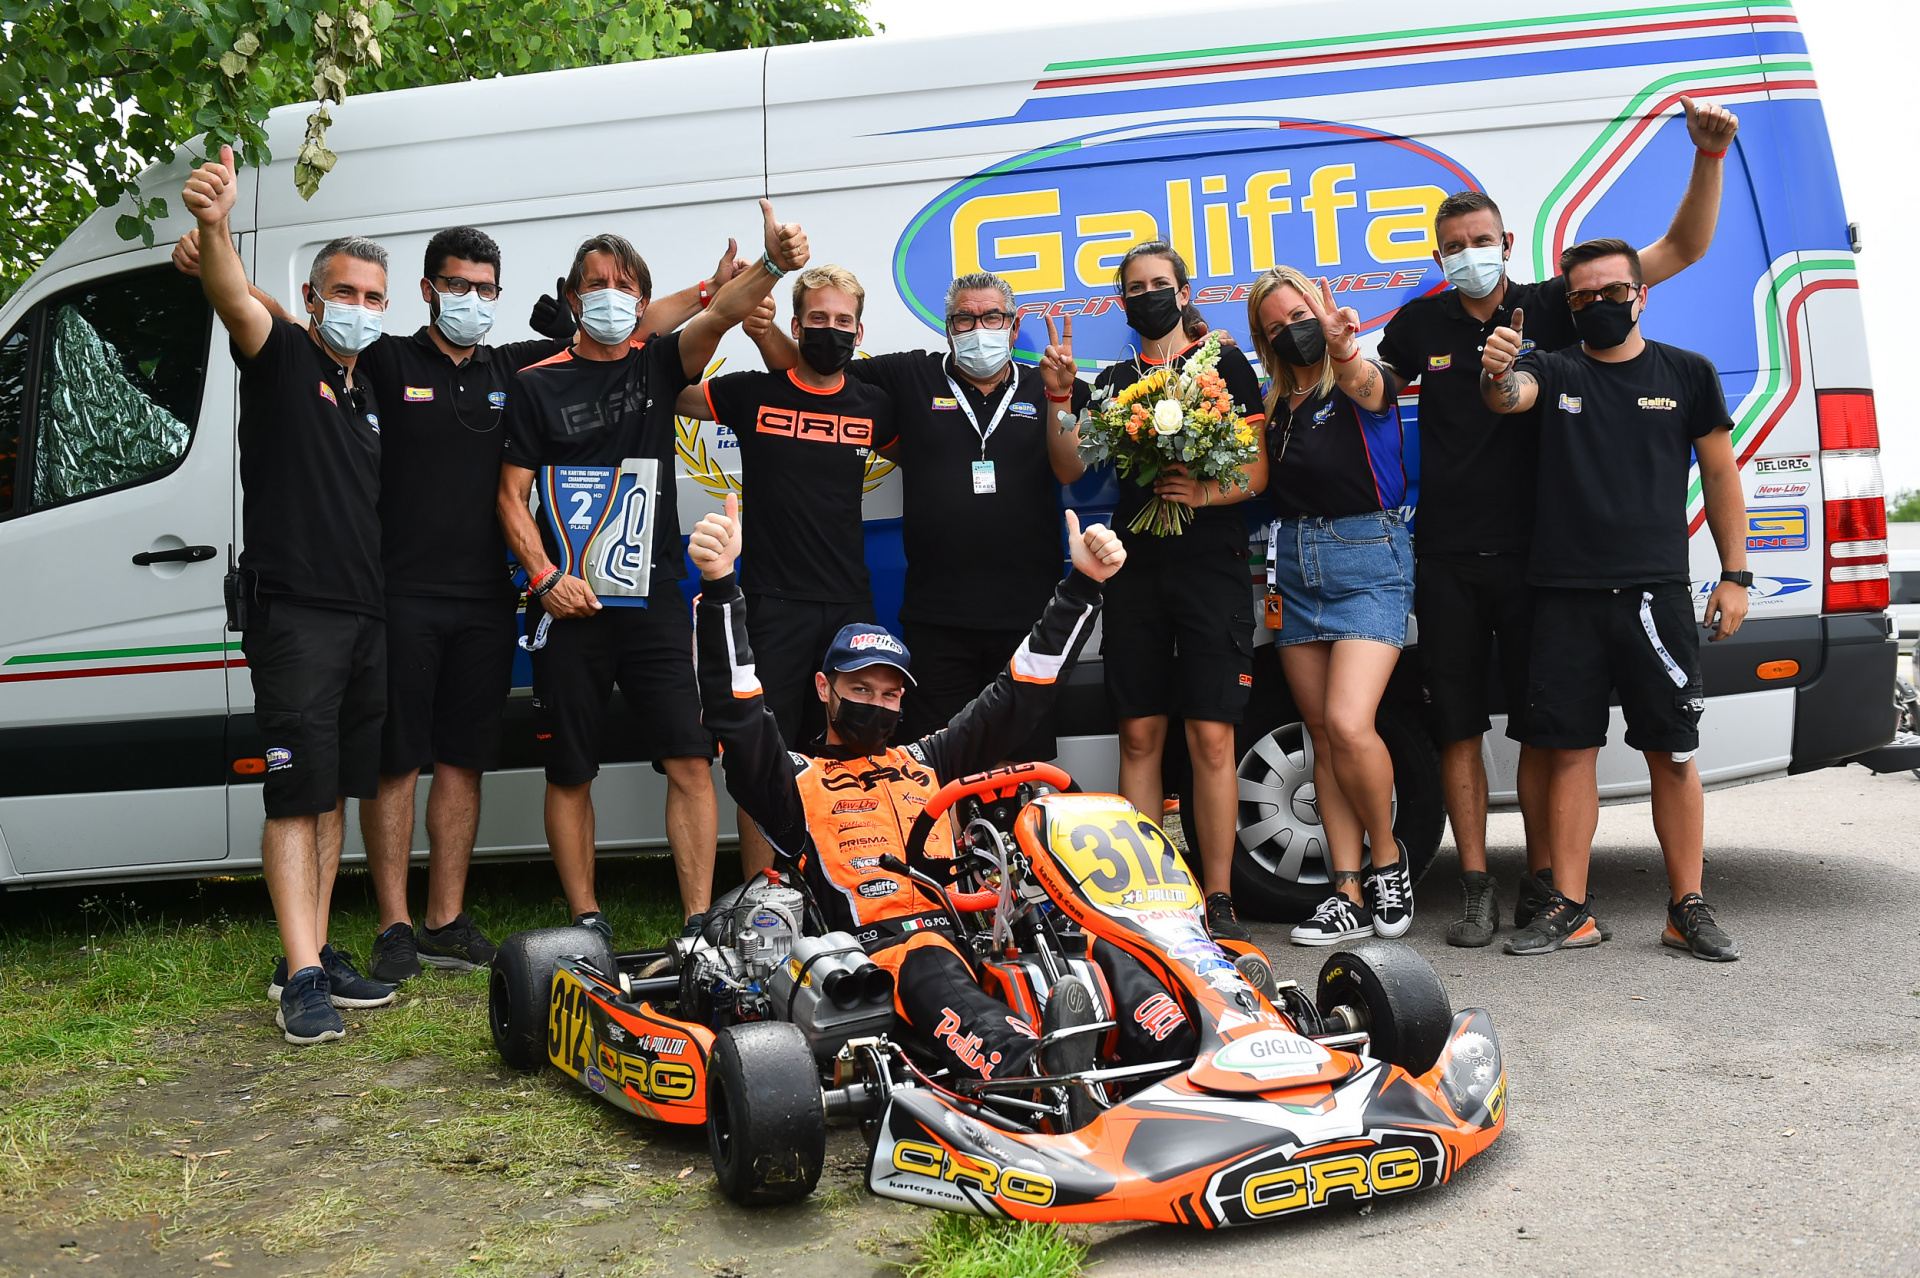 Podio europeo per NGM Motorsport con Giacomo Pollini a Wackersdorf